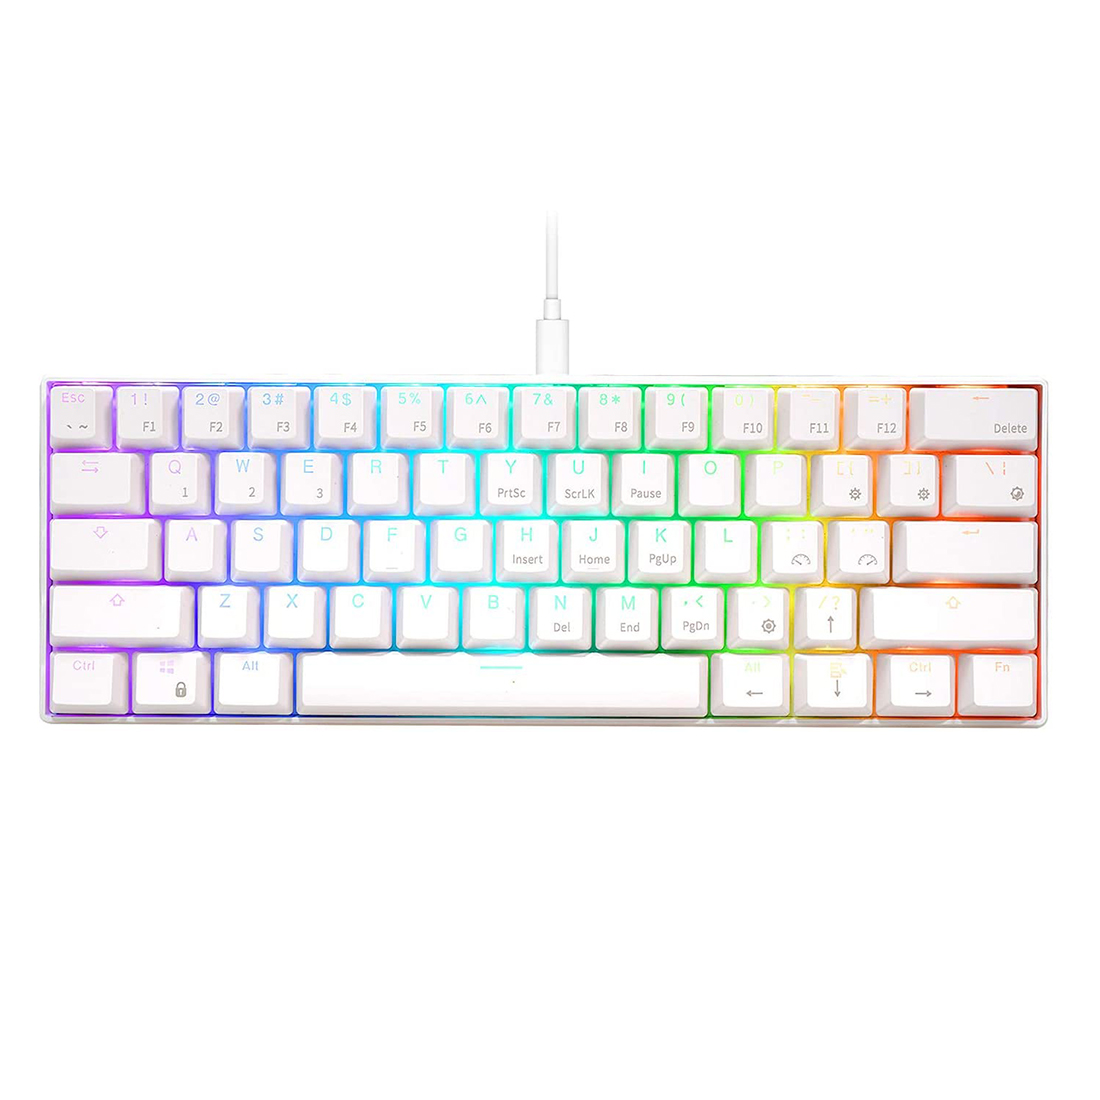 RK61 61 Keys USB 60% Mechanical Gaming Keyboard Compact Bluetooth Keyboard for Windows / Ios / Andoid - White Case + RGB Light (Red Switch)